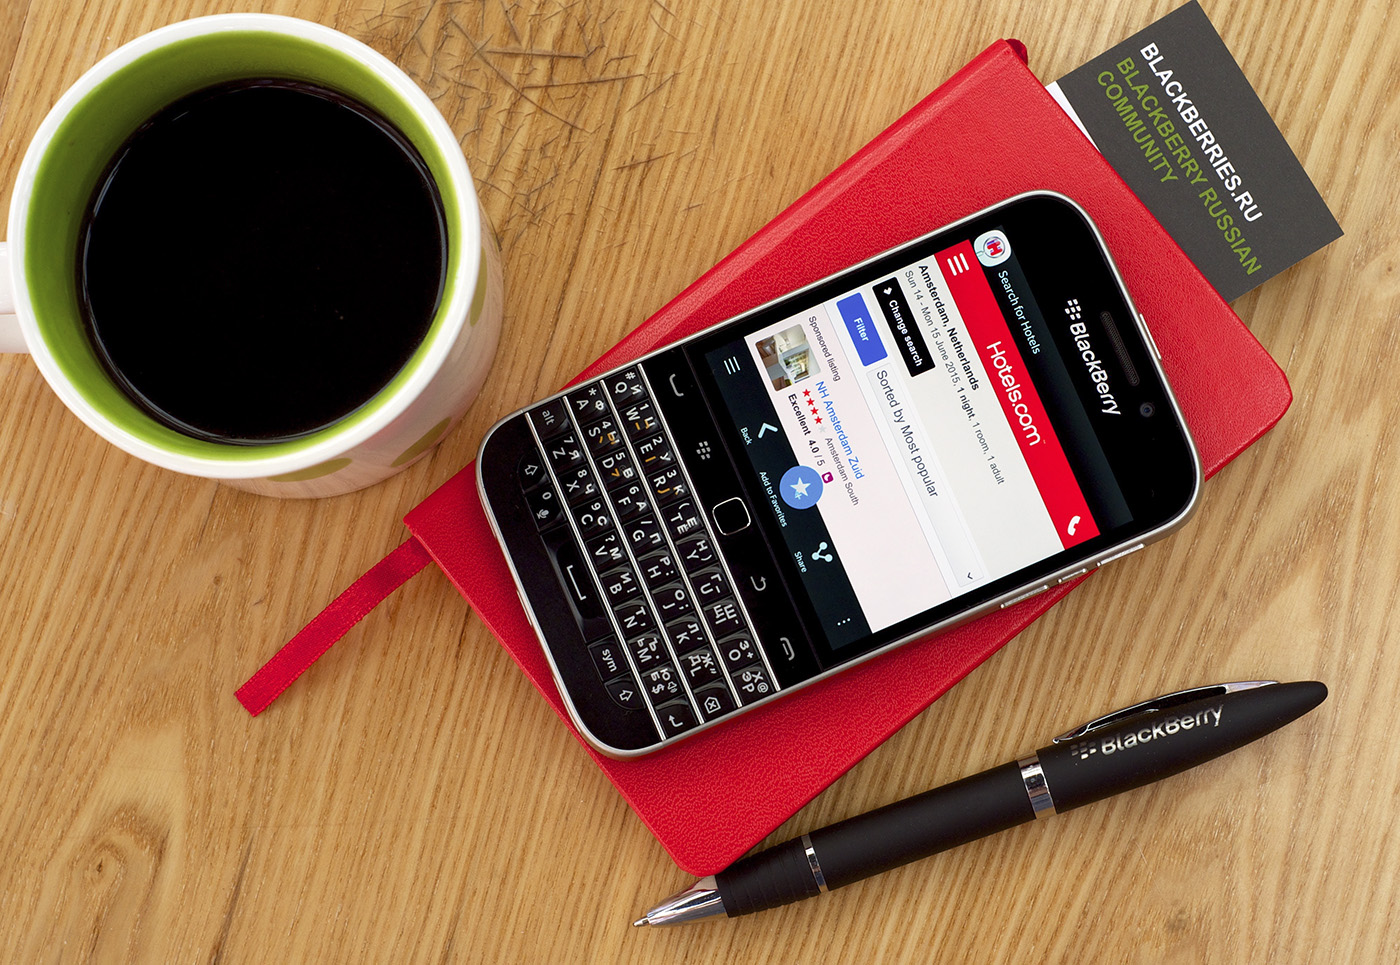 BlackBerry-Classic-Apps-1